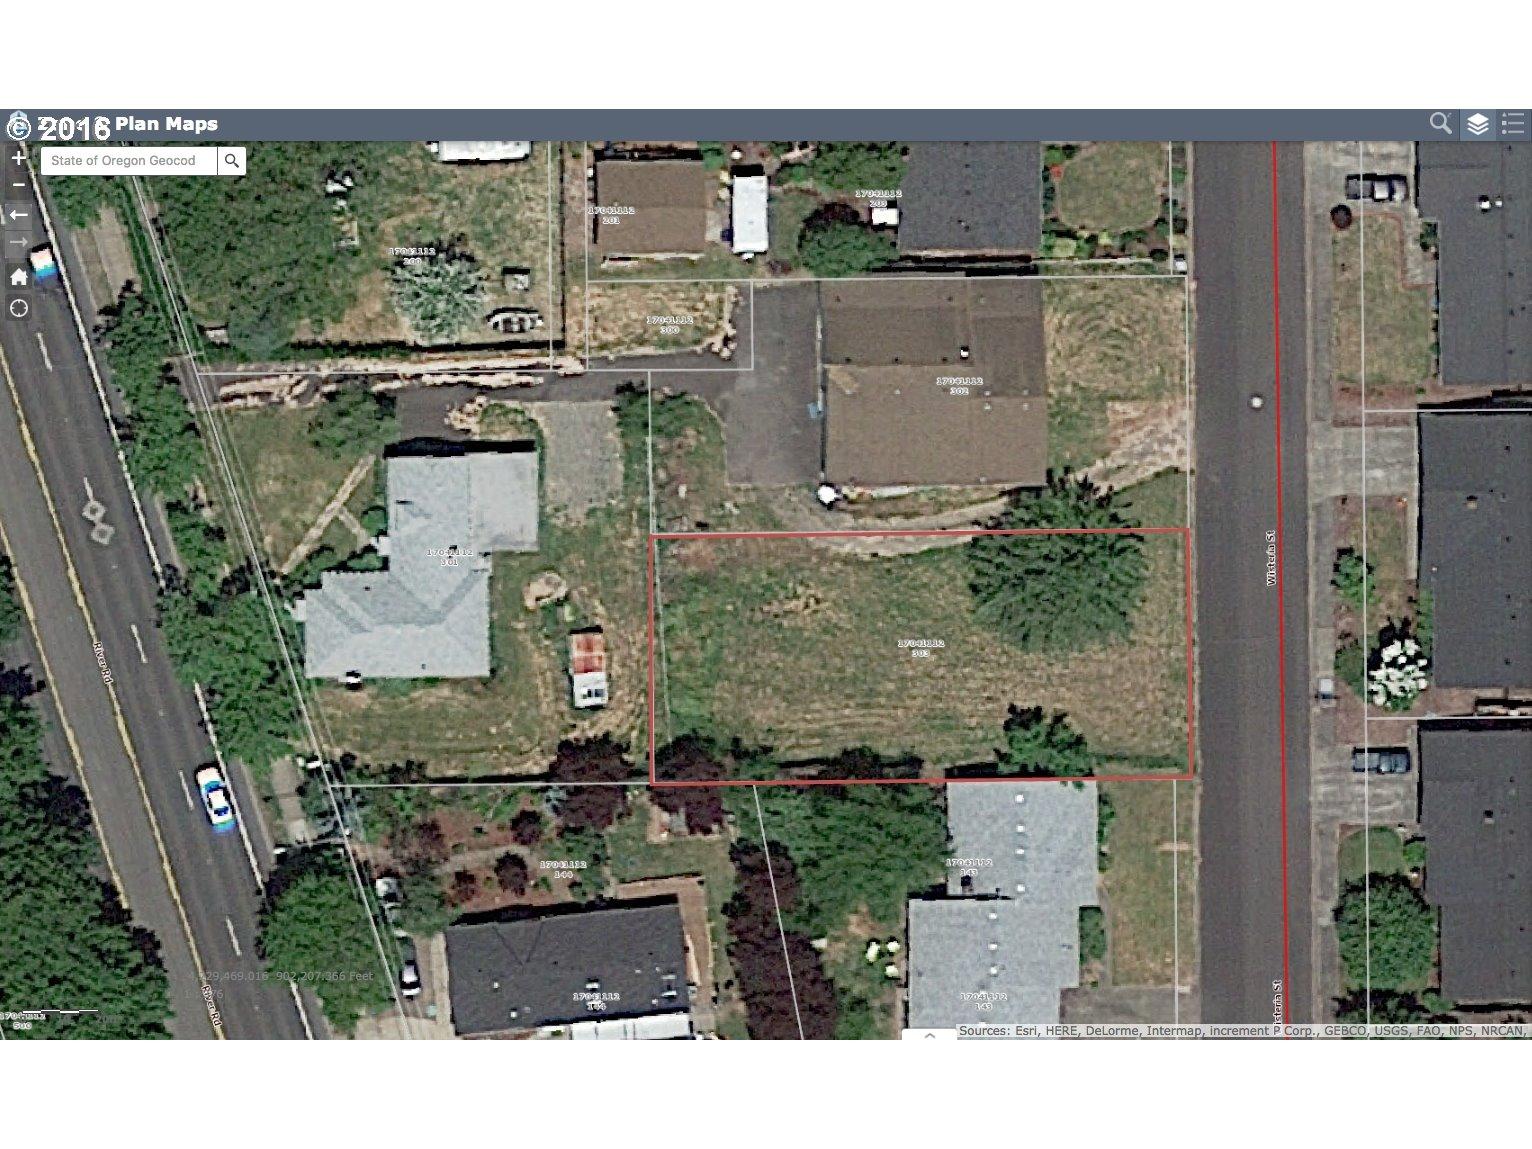 3380 Wisteria ST, Eugene, OR 97404